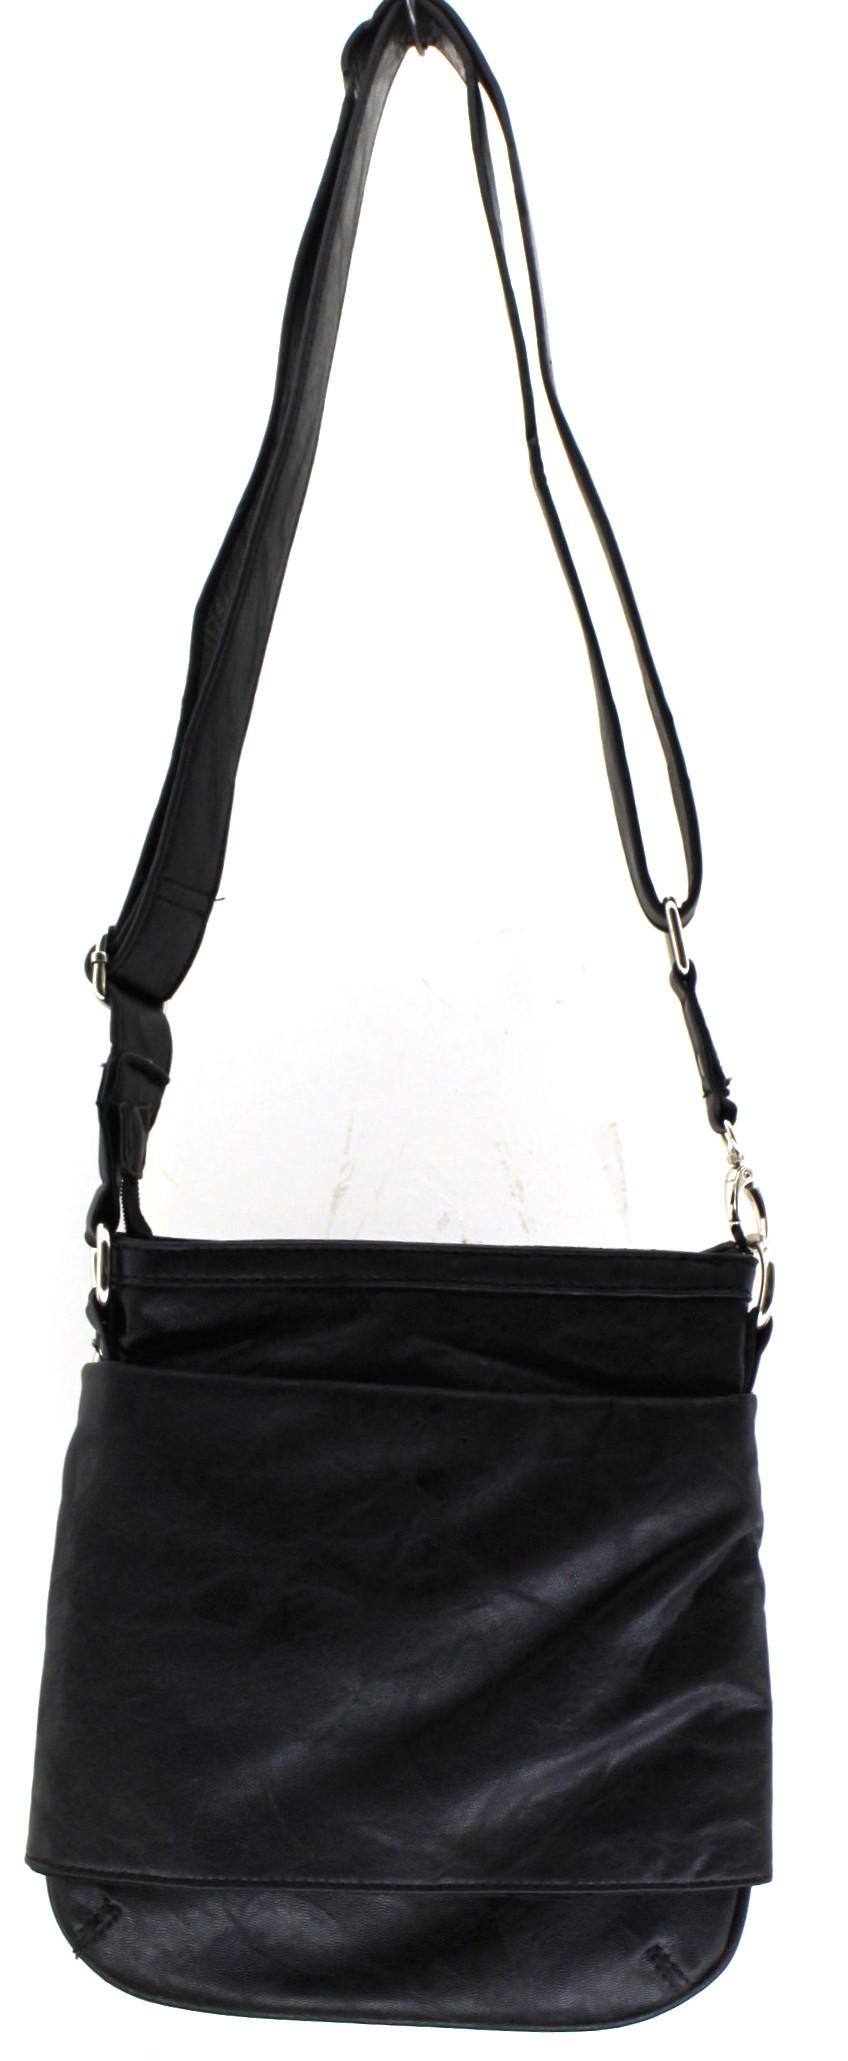 Get Designer Bags Online like authentic Gucci handbags Prada Fendi